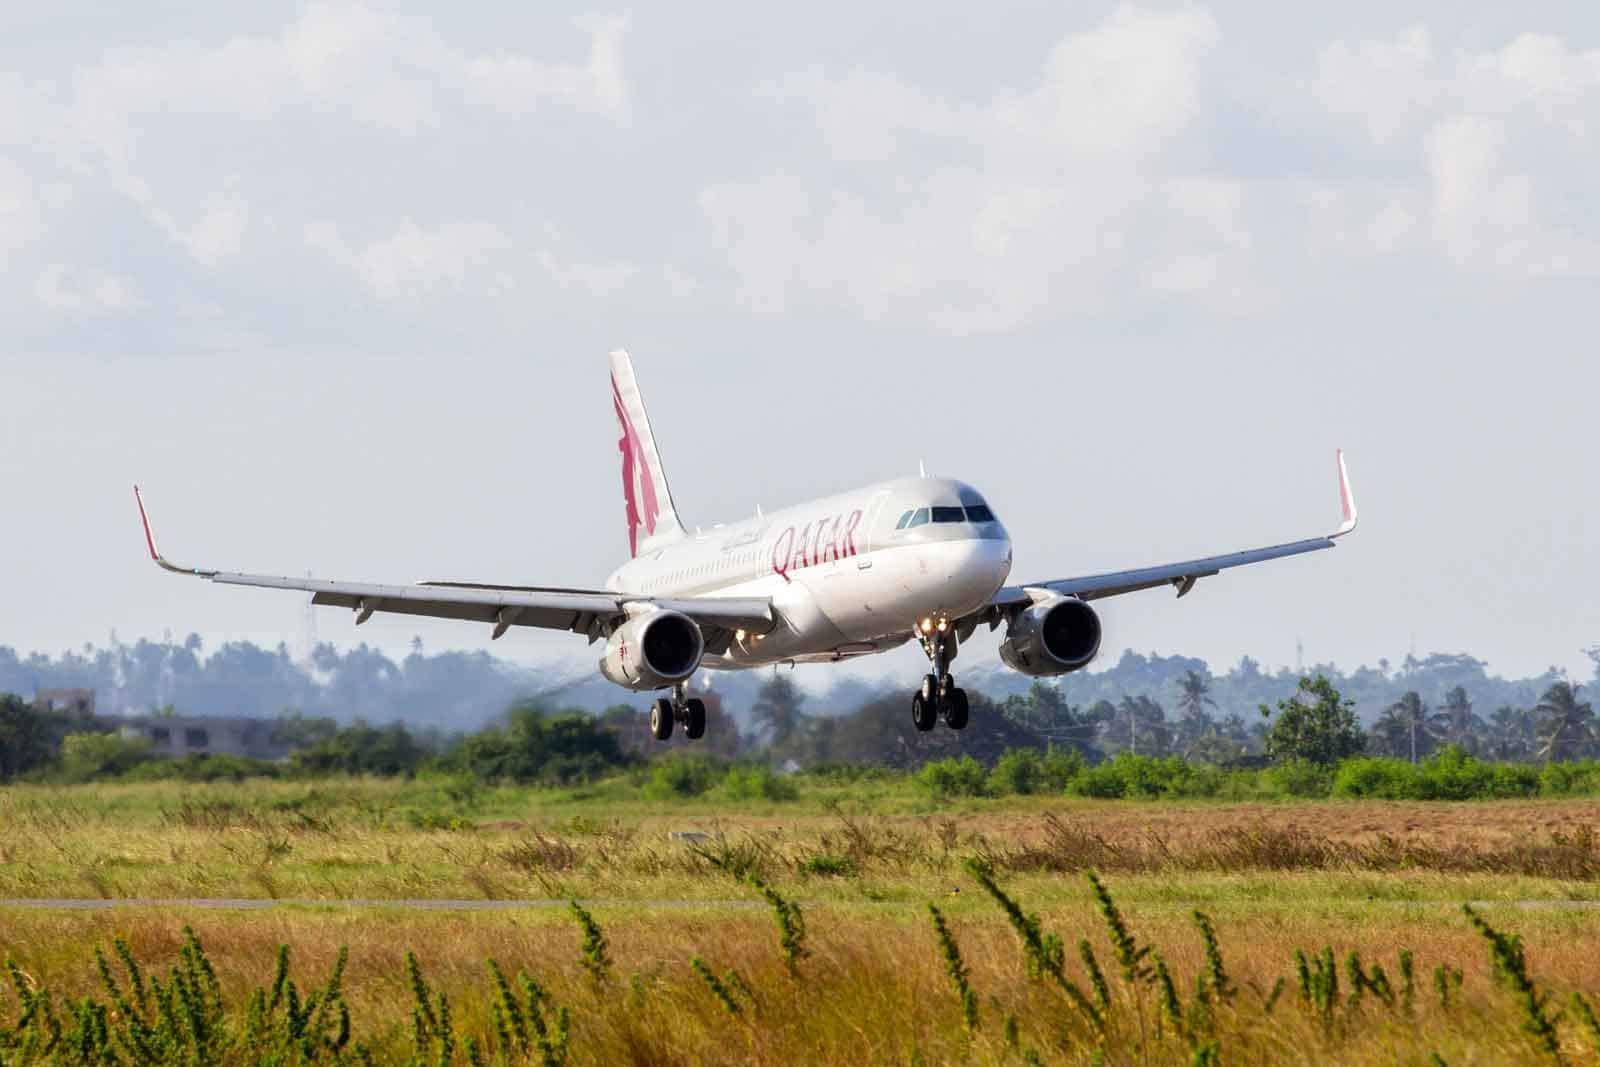 Qatar Airways A320 arrives at Zanzibar Airport